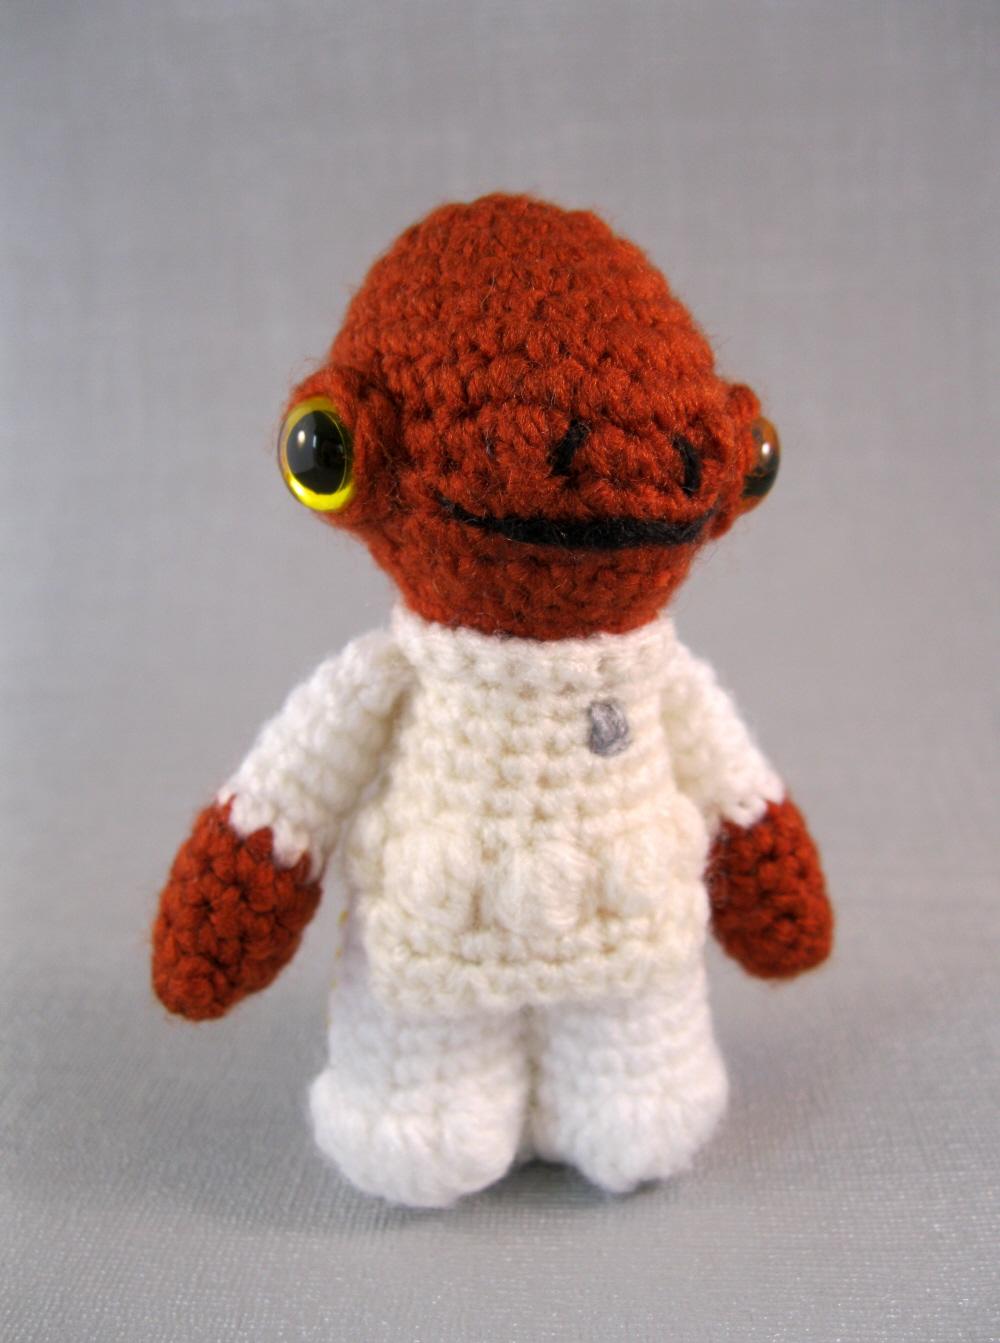 Amigurumi All Star : LucyRavenscar - Crochet Creatures: Admiral Ackbar amigurumi